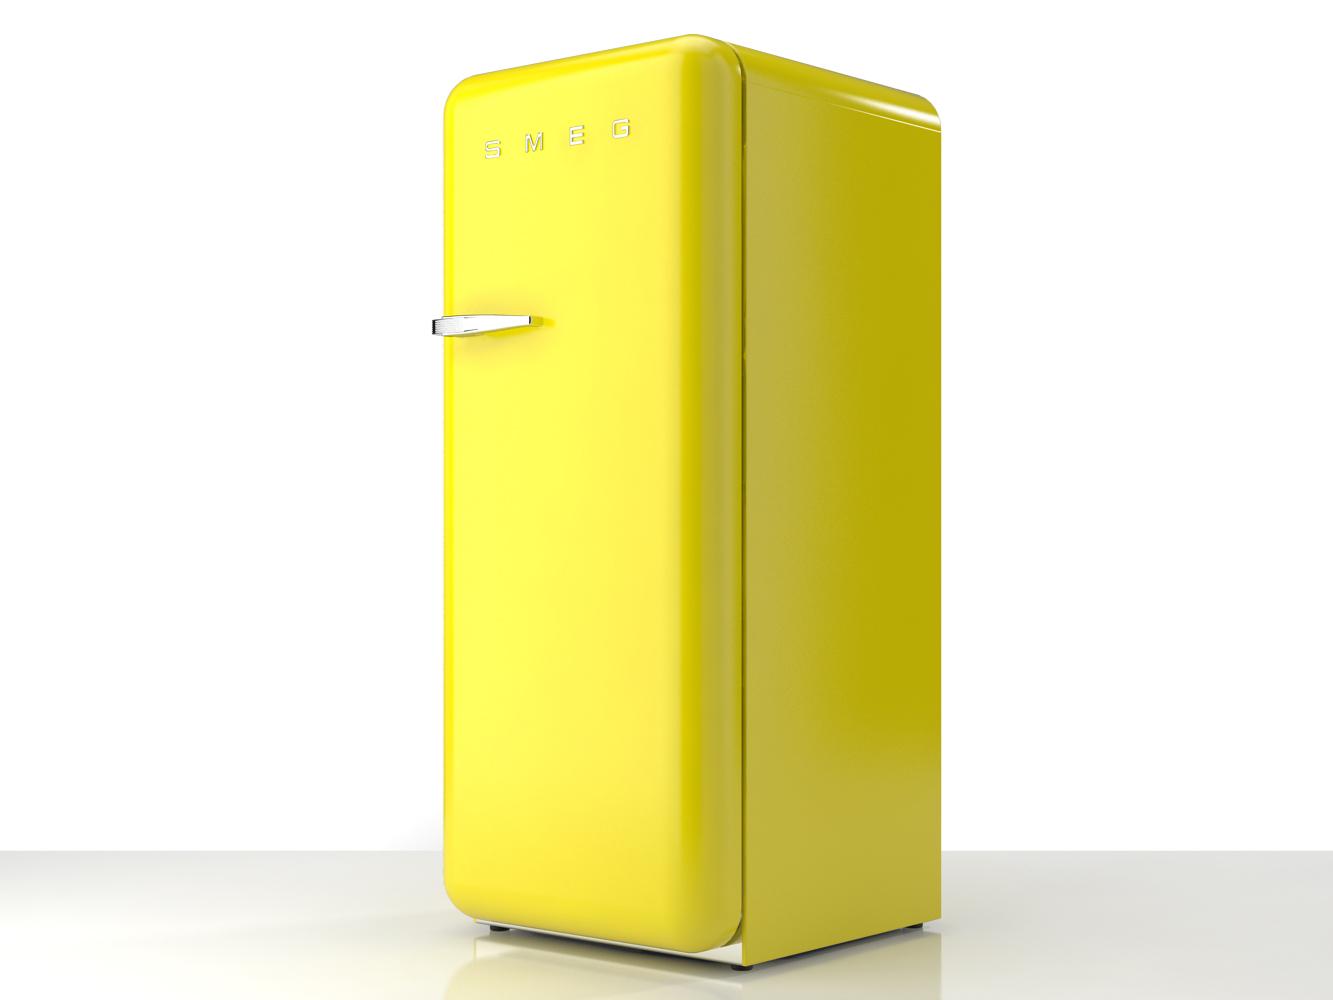 smeg fab28 fridge 7 by dimitarkatsarov on deviantart. Black Bedroom Furniture Sets. Home Design Ideas